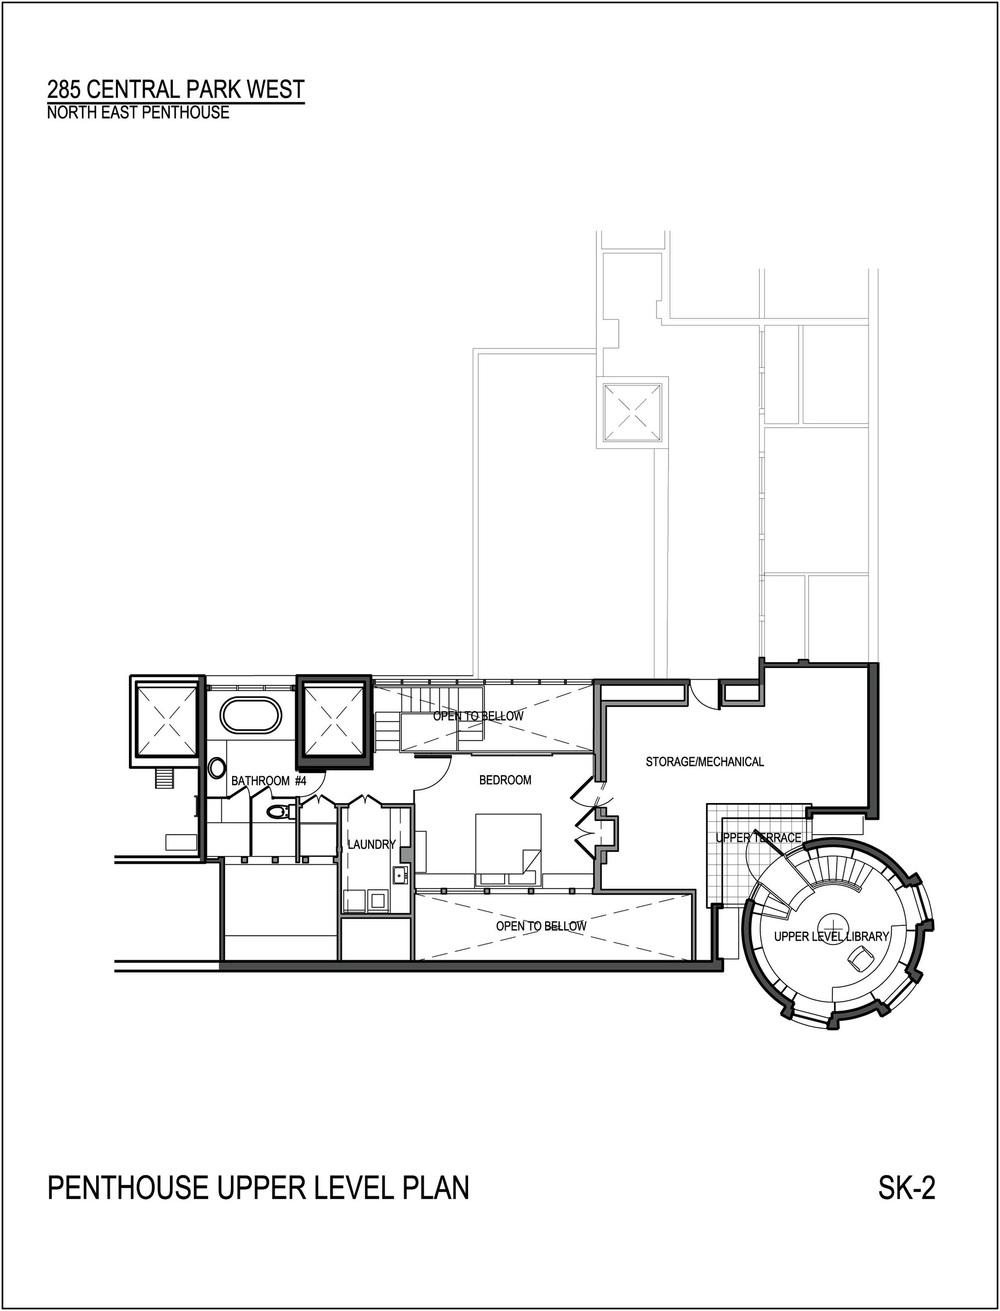 Penthouse Floor Plan sk-2.jpg